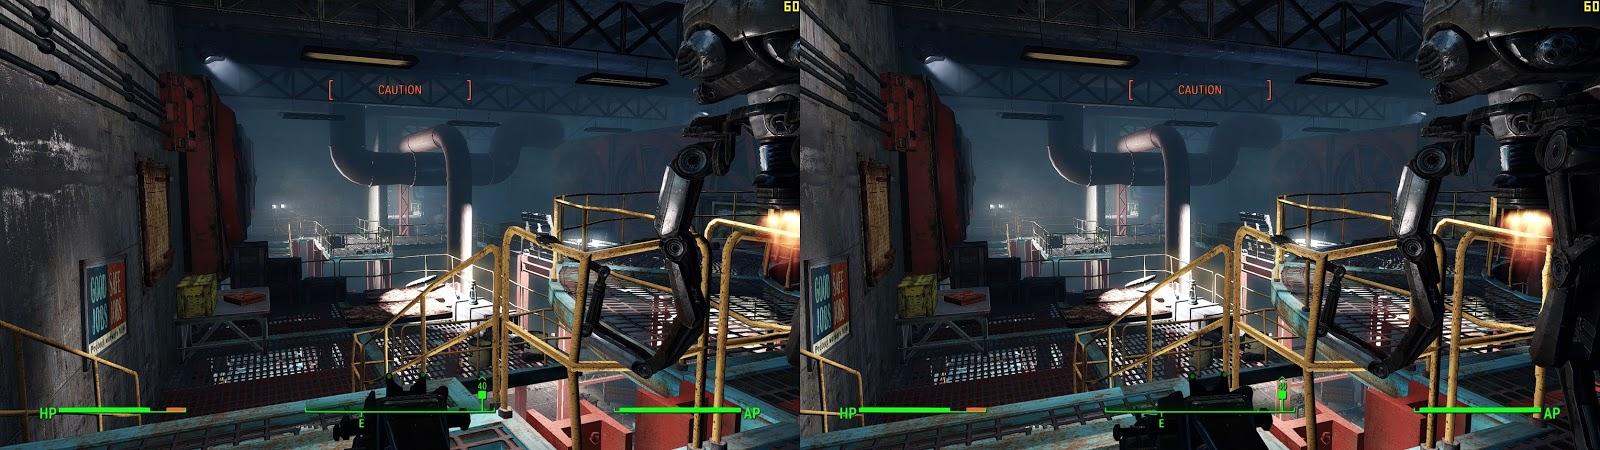 Helix Mod: Fallout 4